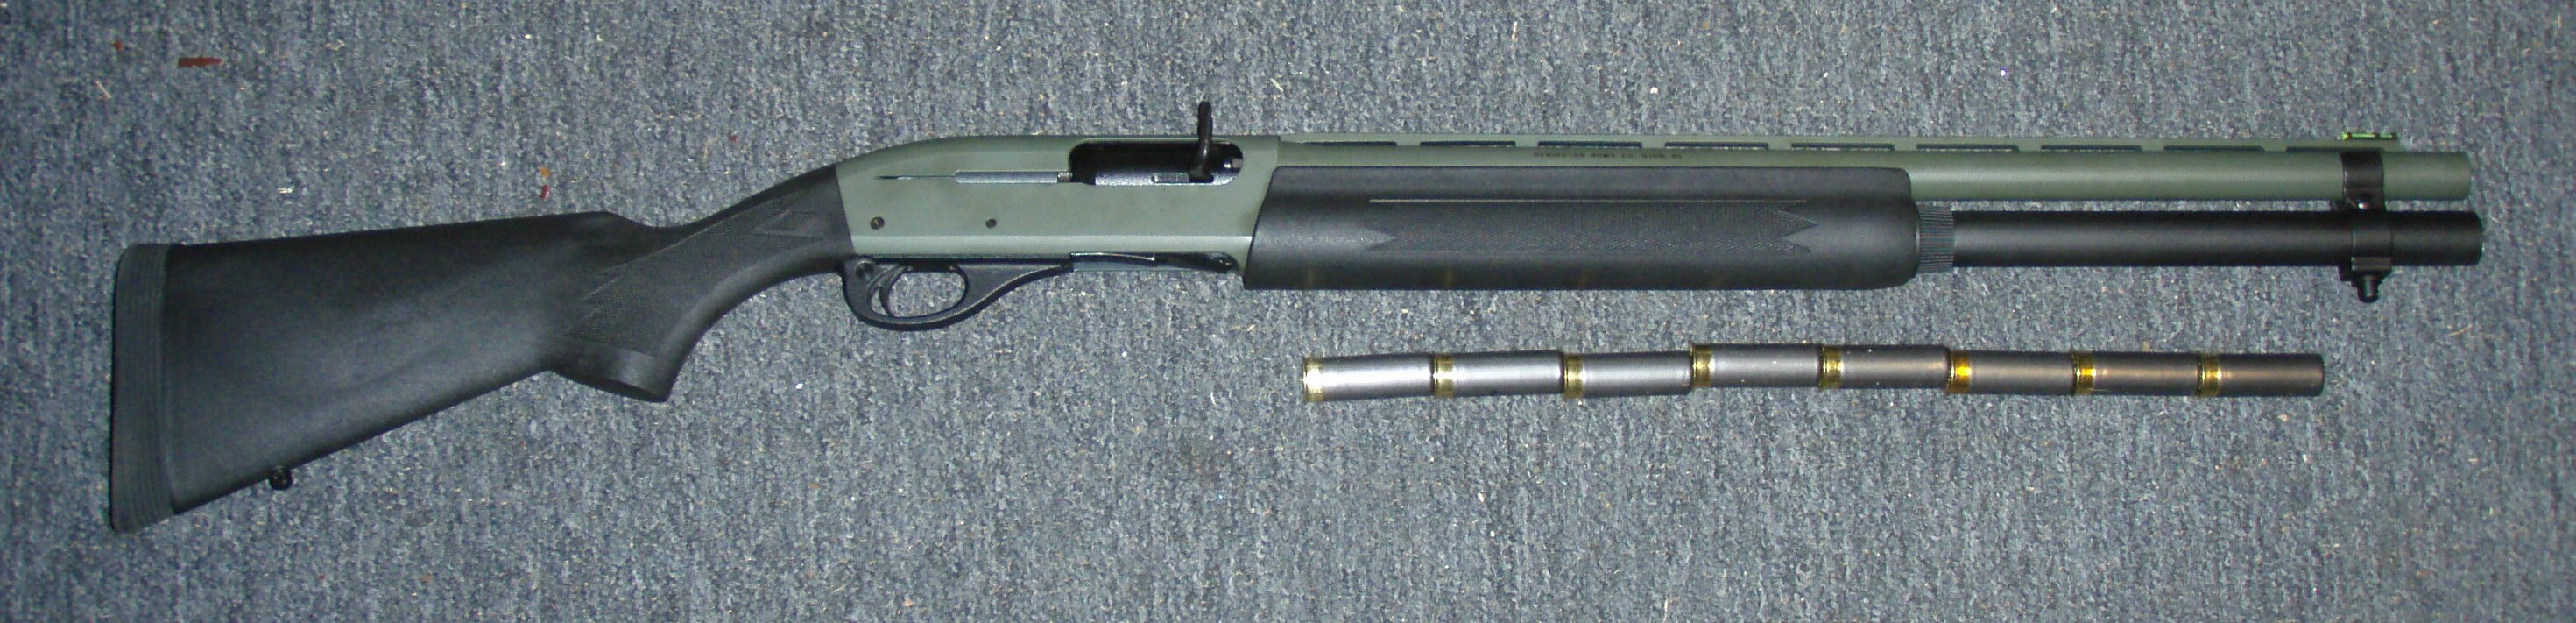 Semi-automatic firearm | Wiki | Everipedia